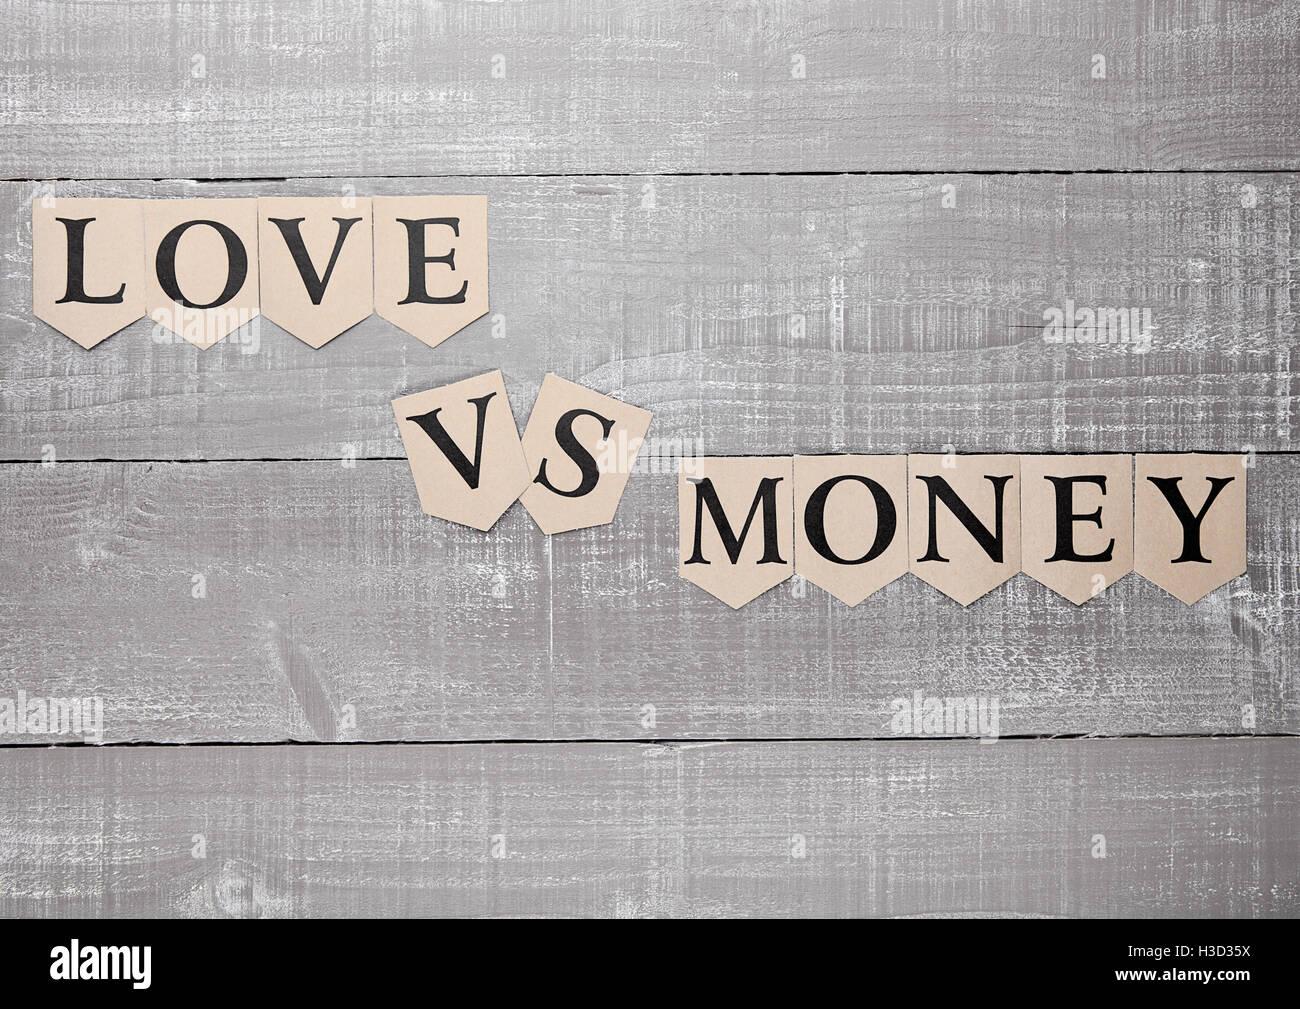 love vs money paper letters symbol motivation sign on wooden board - Stock Image